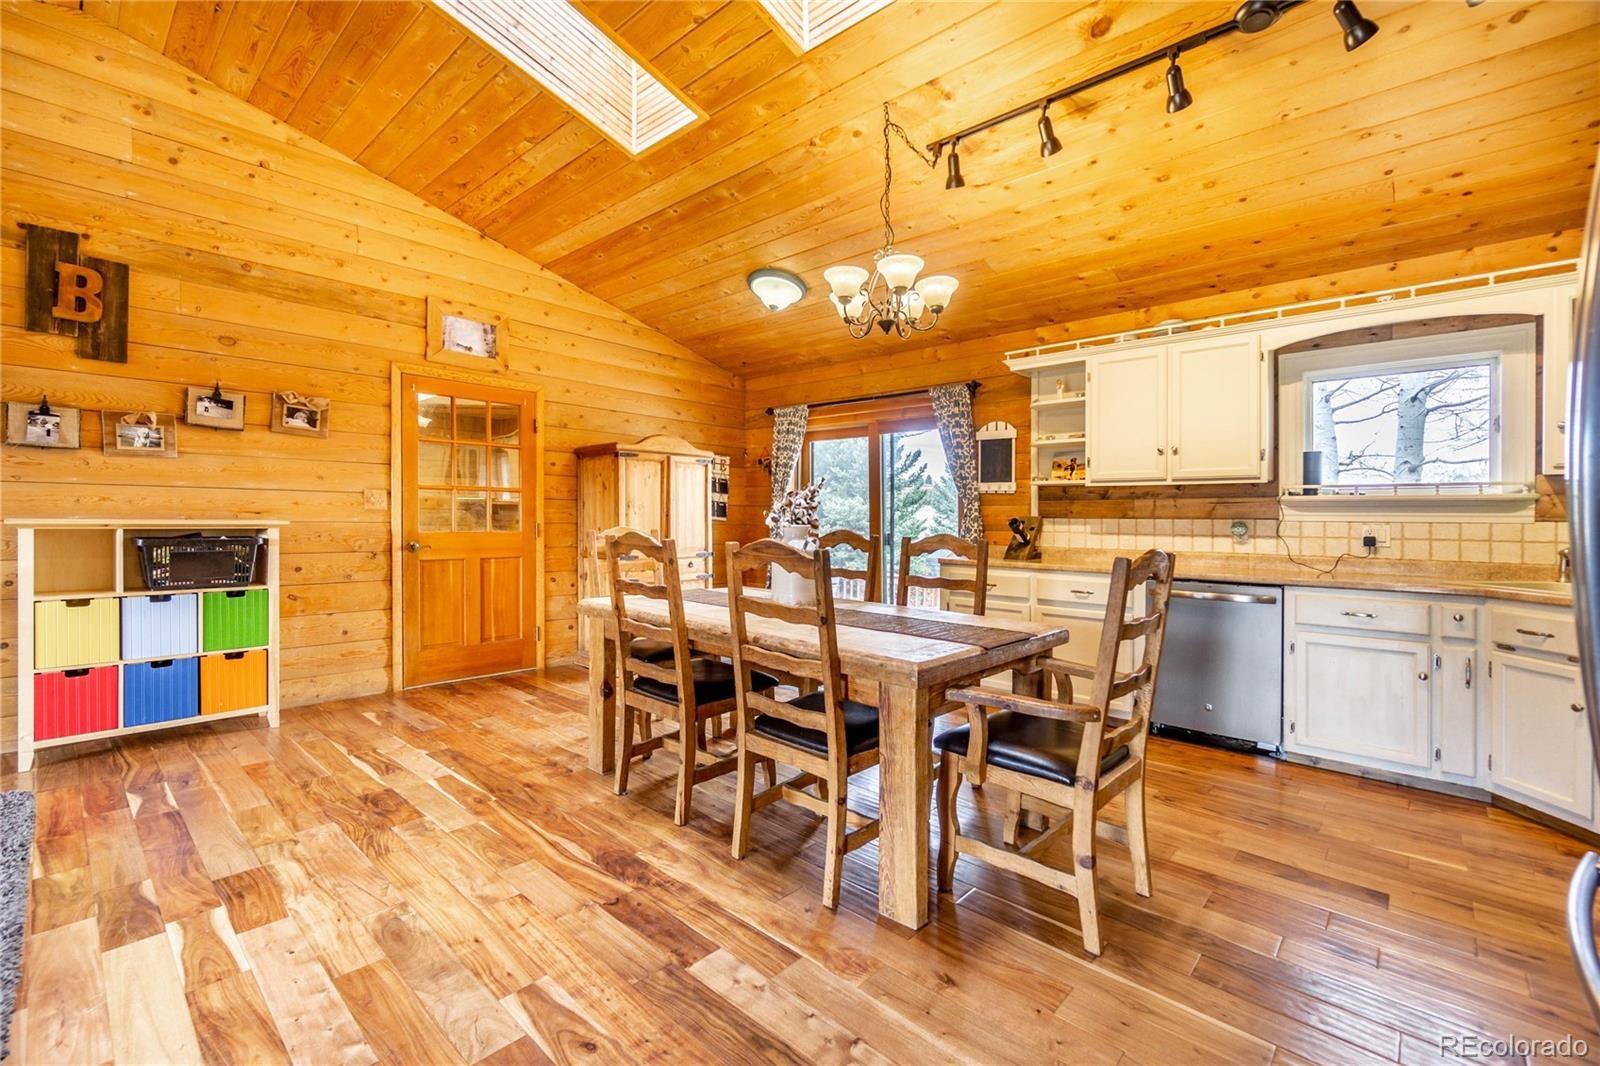 MLS# 9978460 - 14 - 893 Tioga Trail, Parker, CO 80138